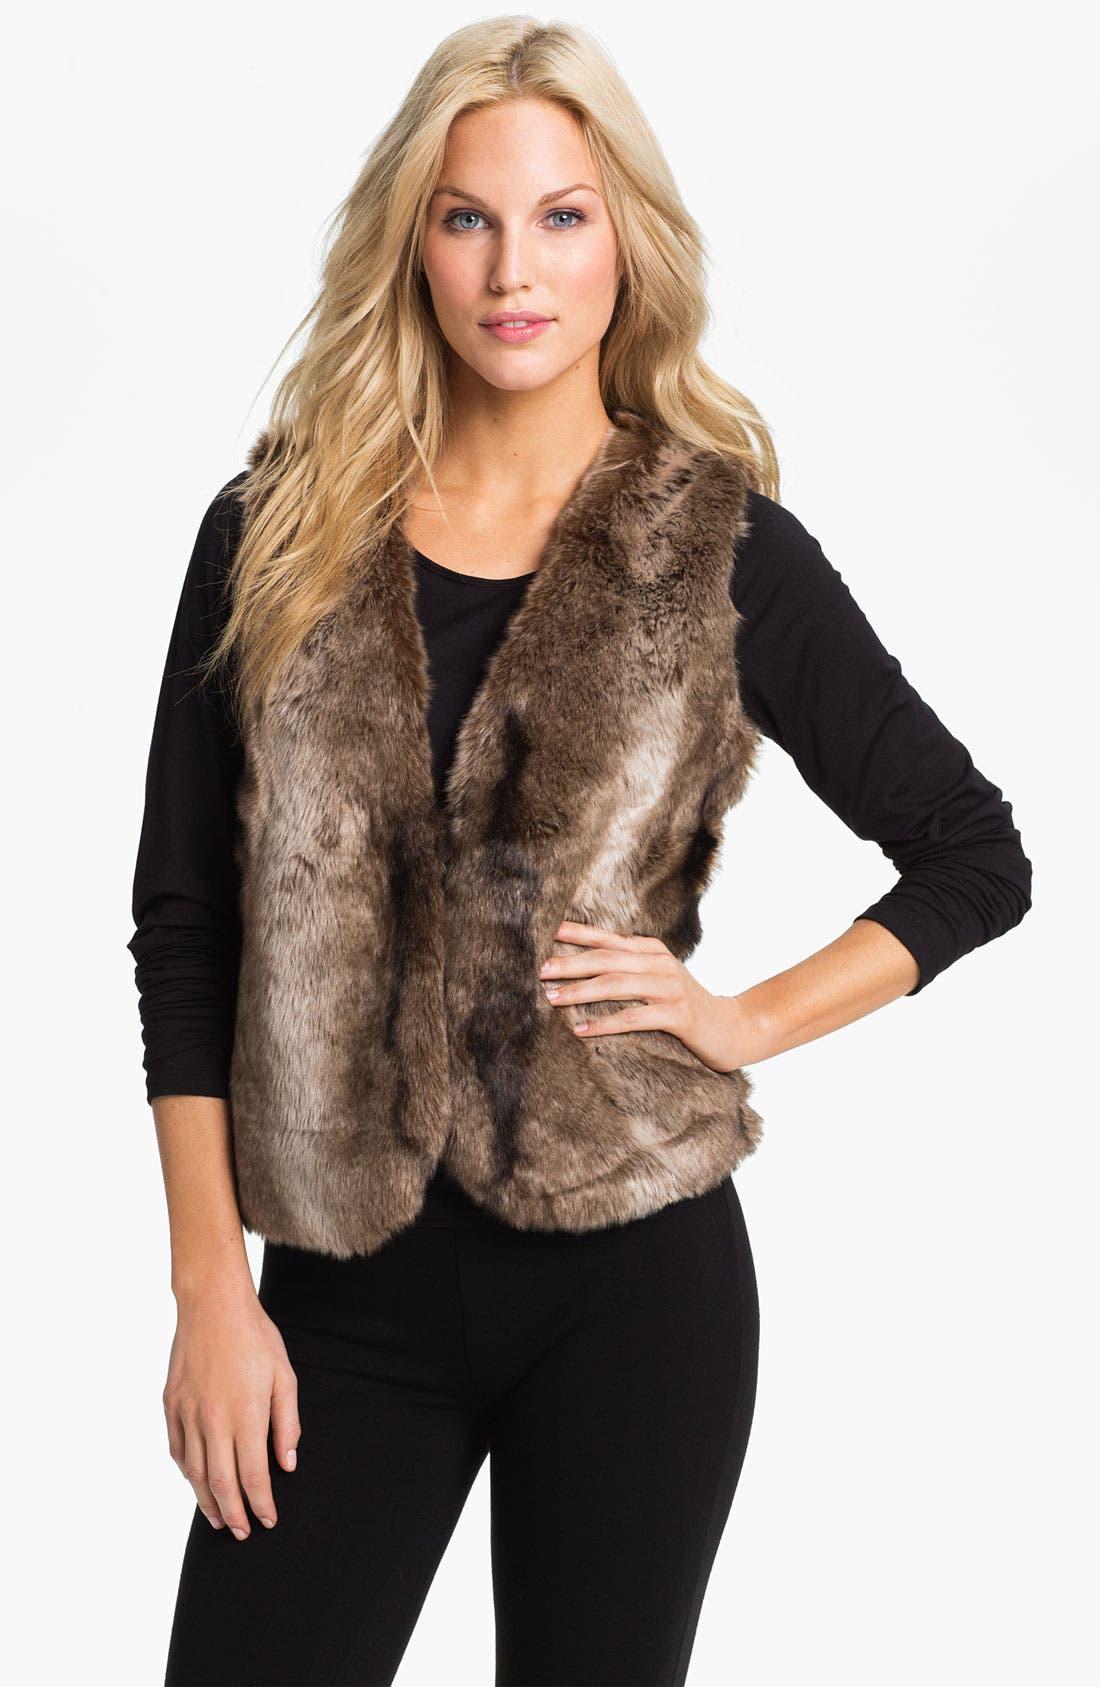 Alternate Image 1 Selected - PJ Luxe Faux Fur Vest